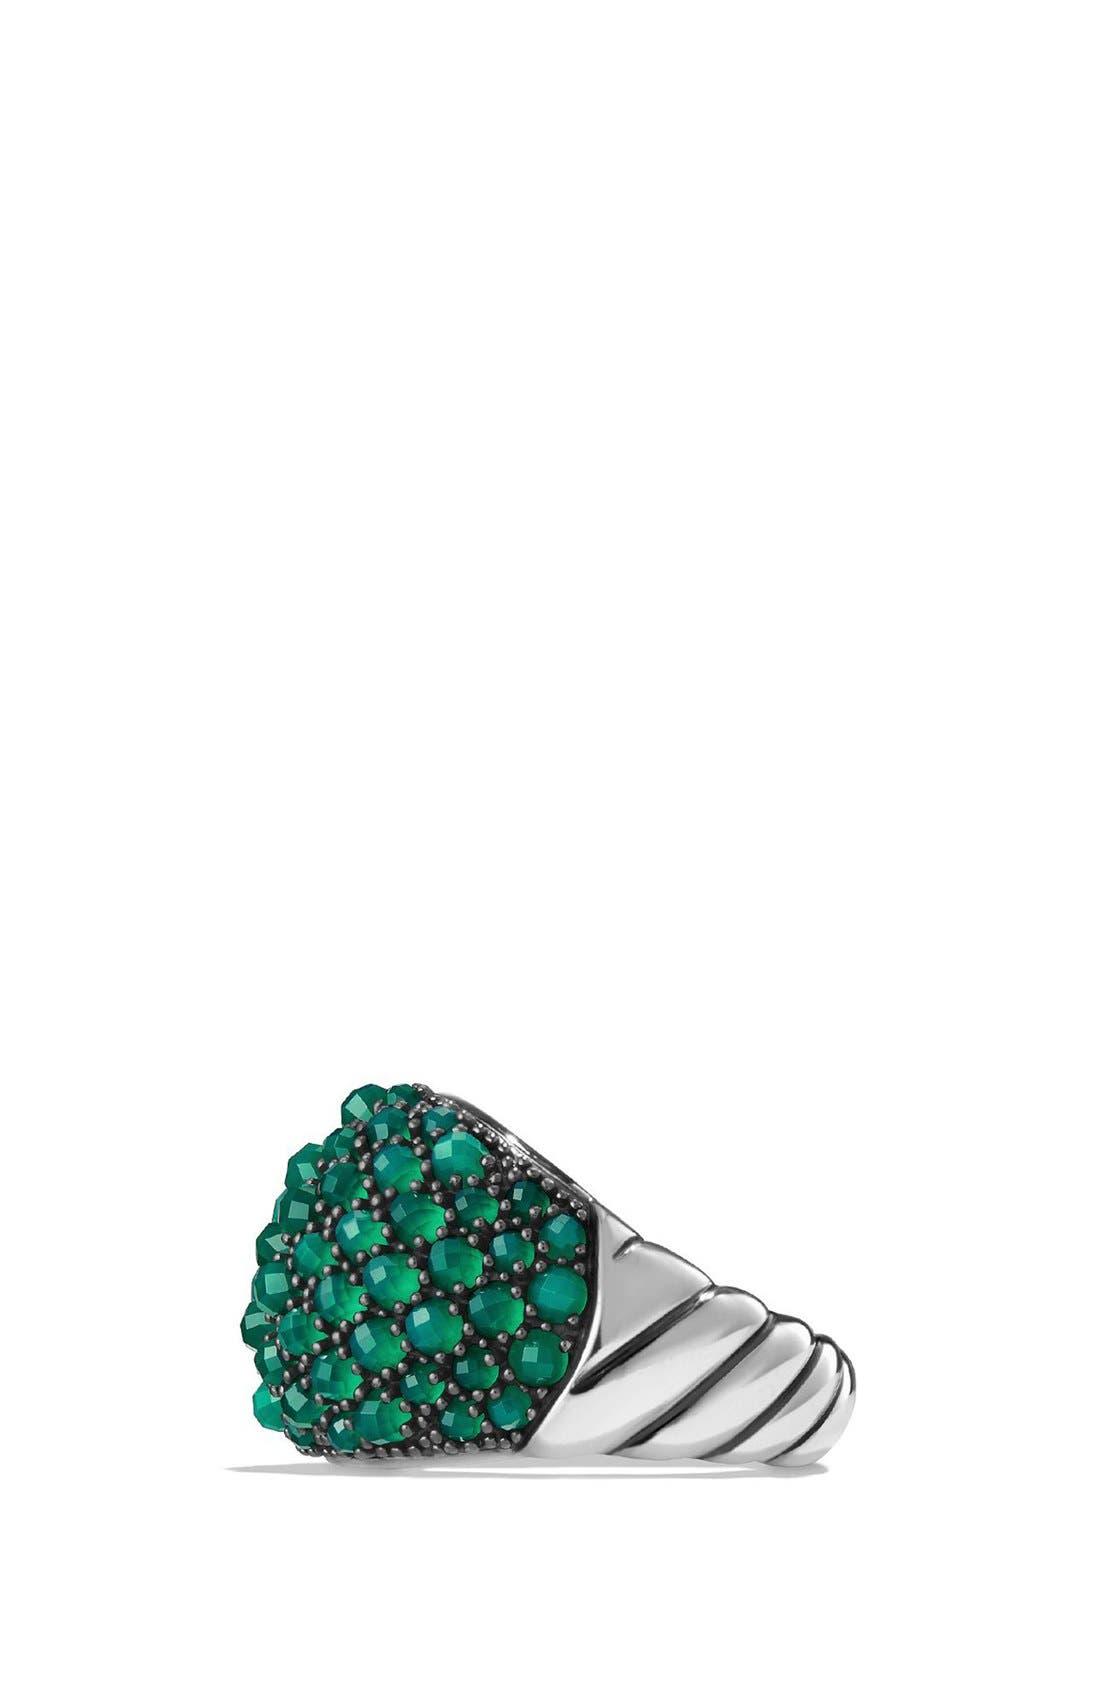 DAVID YURMAN,                             Cable Berries Dome Ring,                             Alternate thumbnail 3, color,                             300